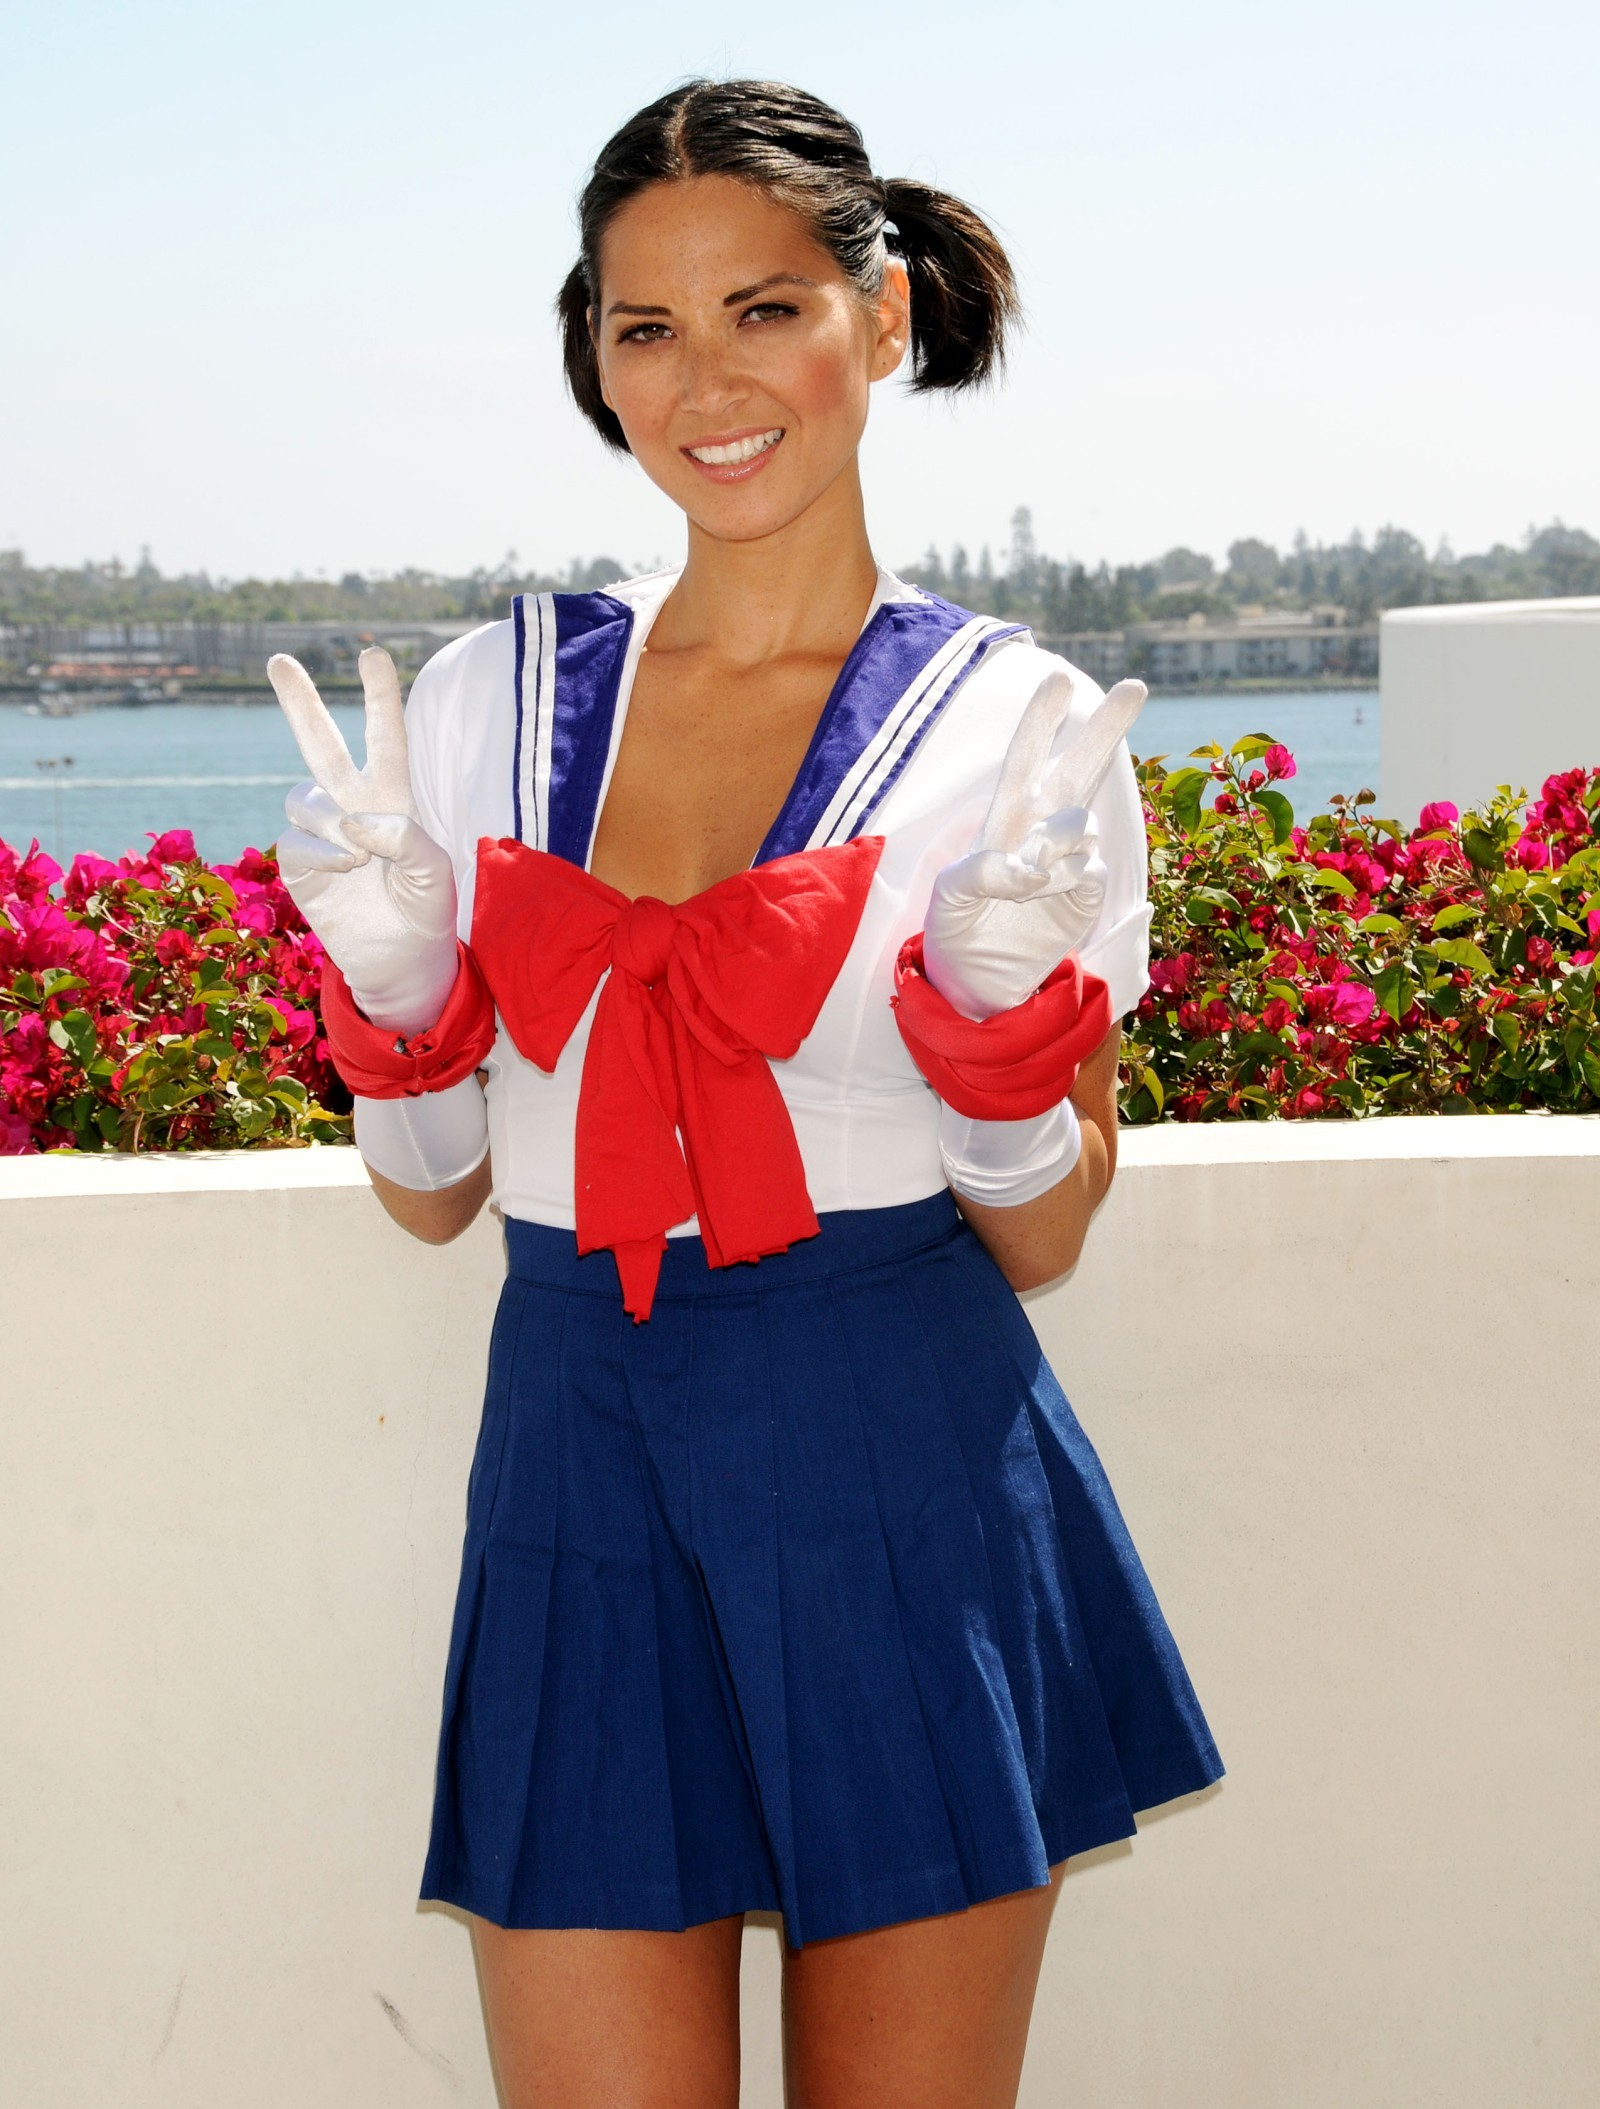 olivia_munn_cosplay_as_sailor_moon